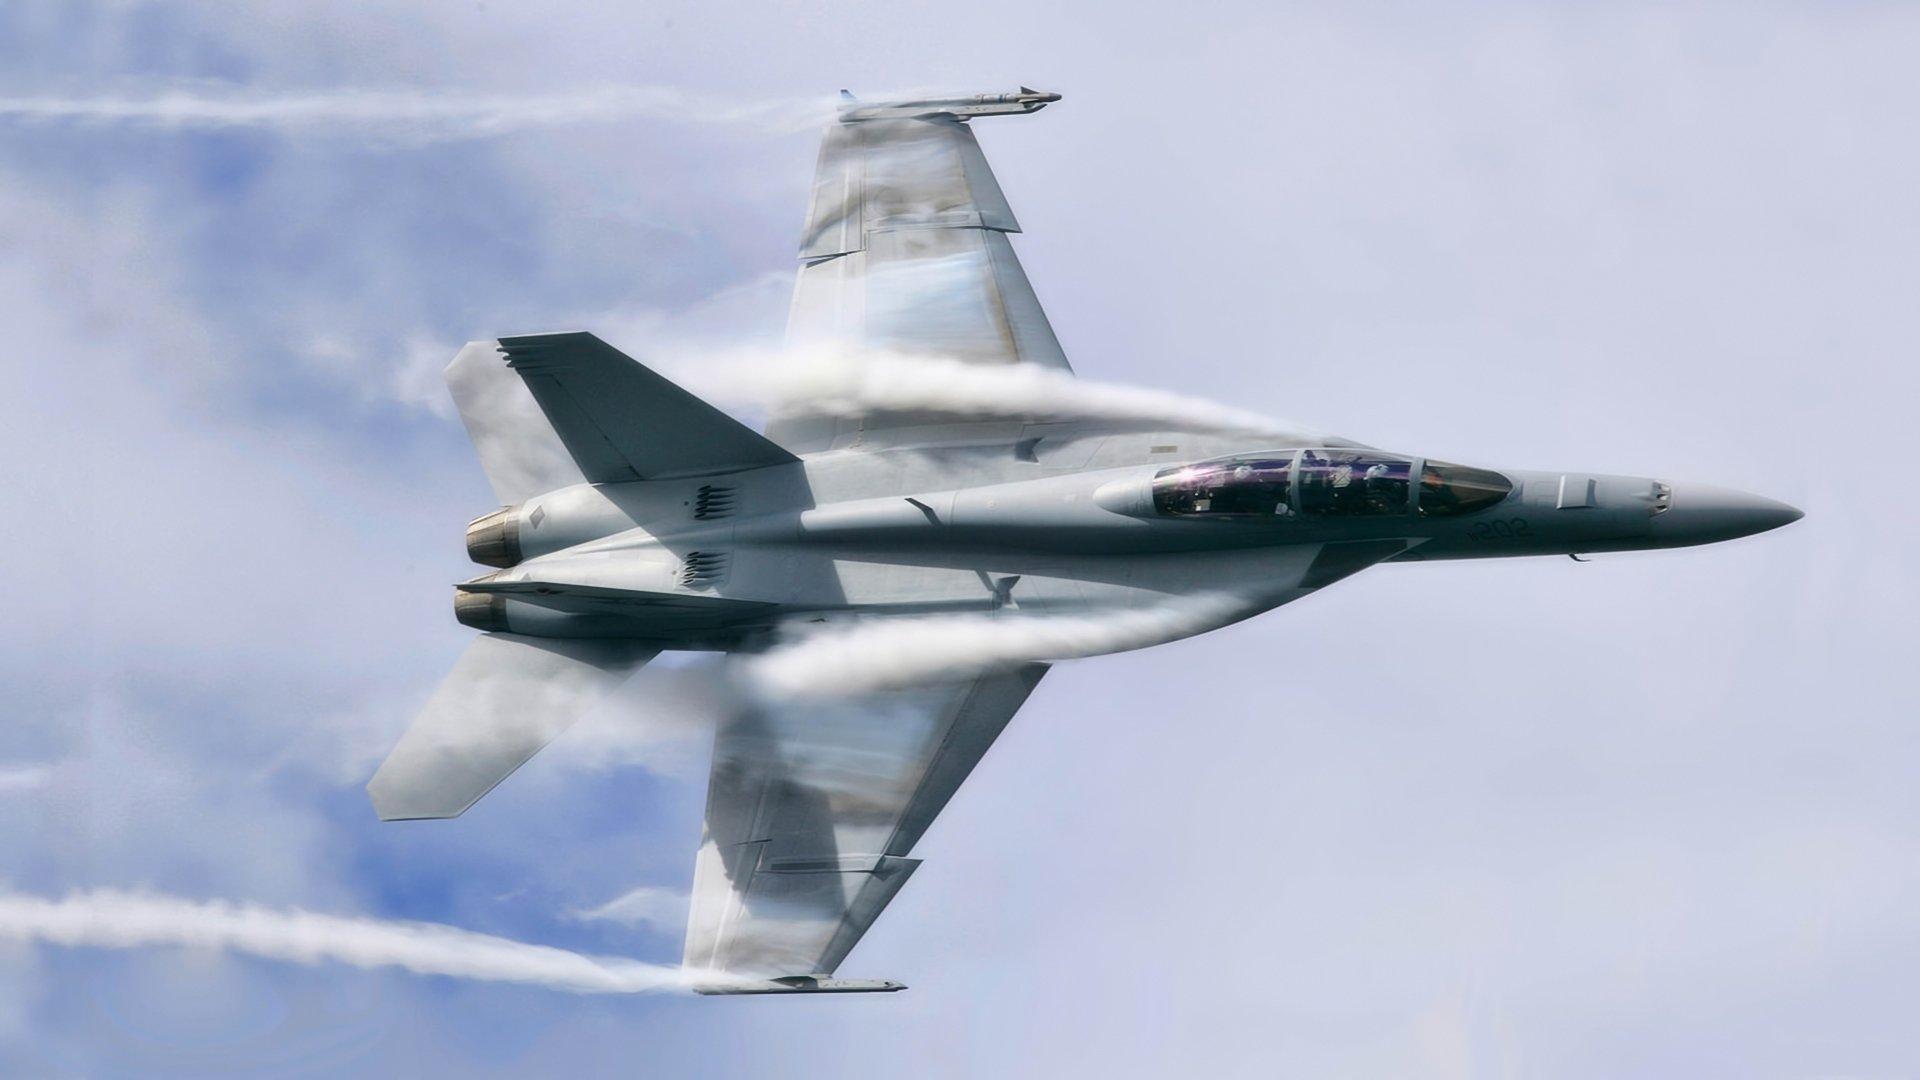 Boeing F A 18e F Super Hornet Wallpapers Hd For Desktop Backgrounds